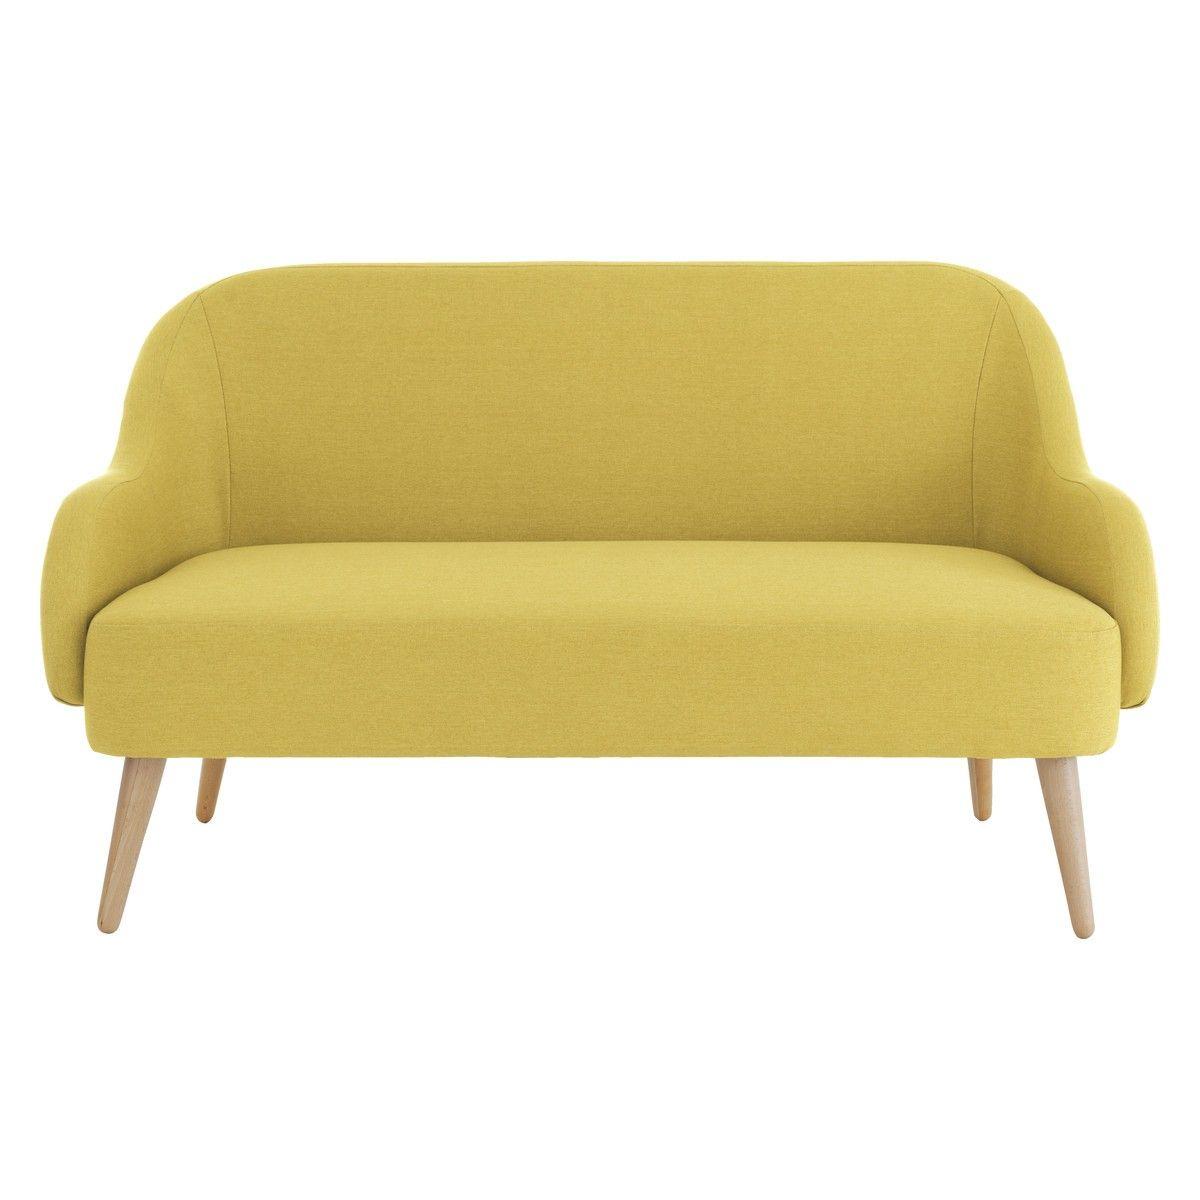 Sofa Sleeper MOMO Saffron yellow fabric seater sofa